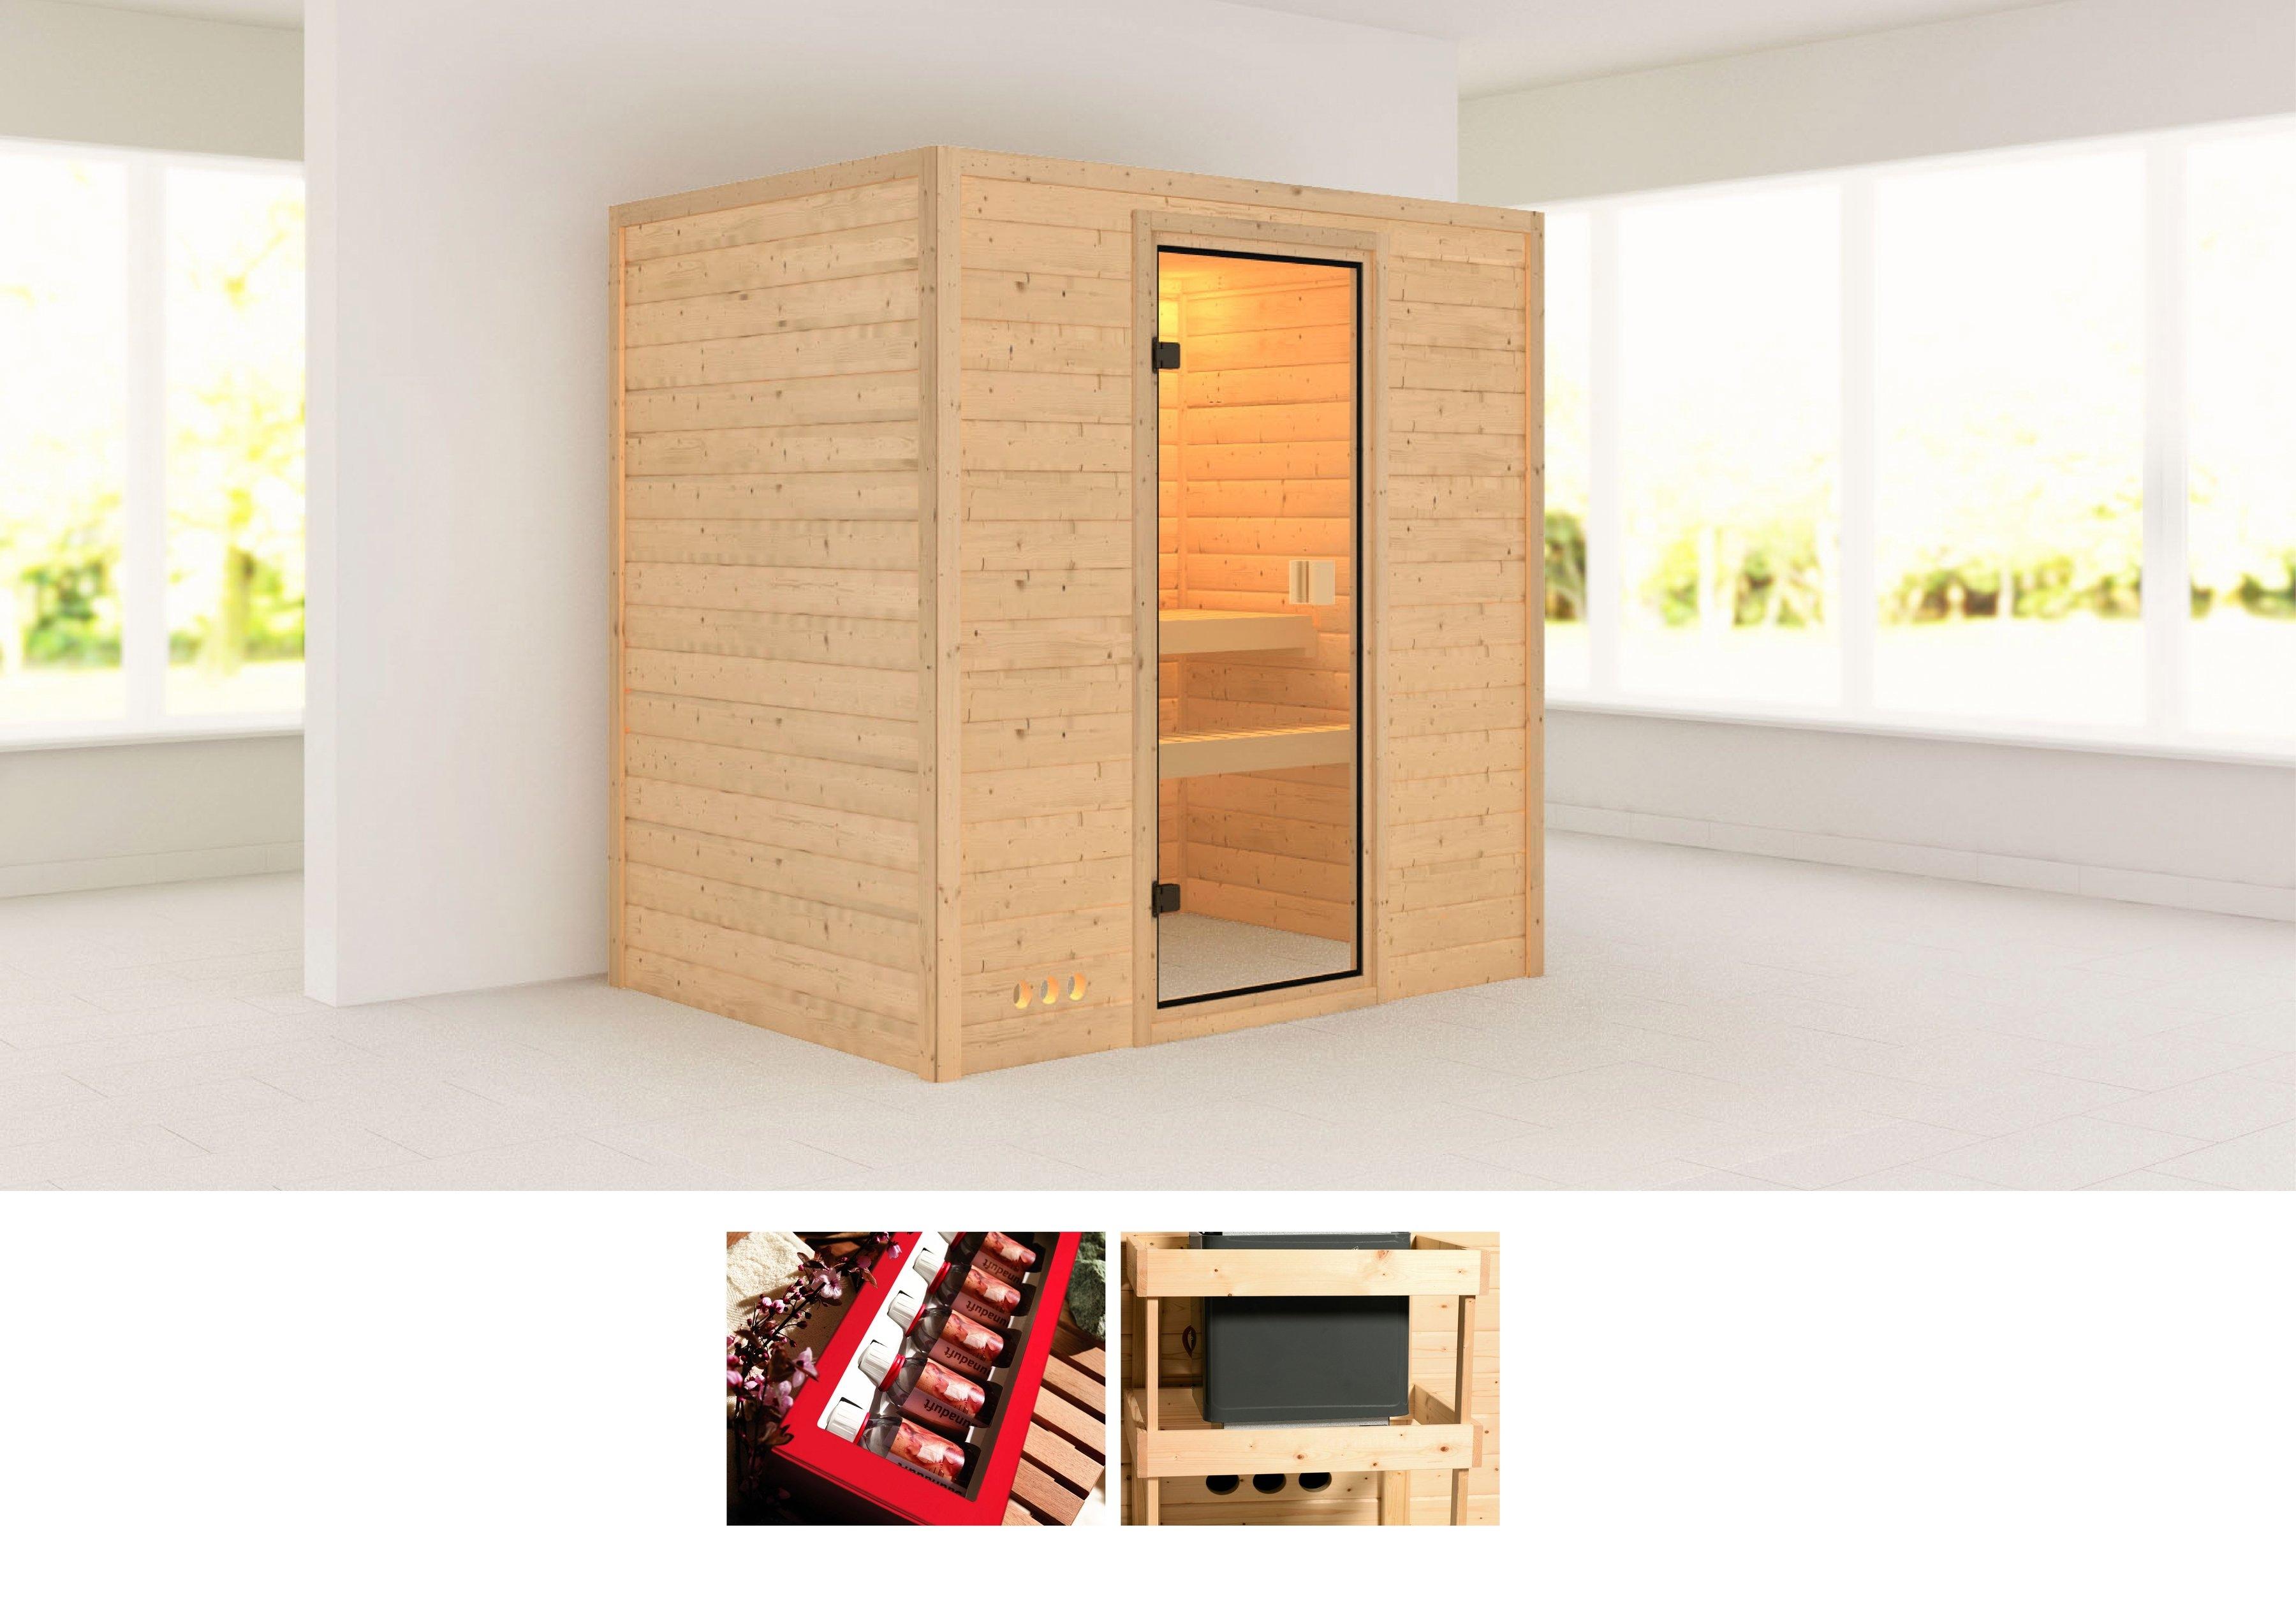 KONIFERA sauna »Sonja«, 196/146/198 cm, ohne Ofen - gratis ruilen op otto.nl